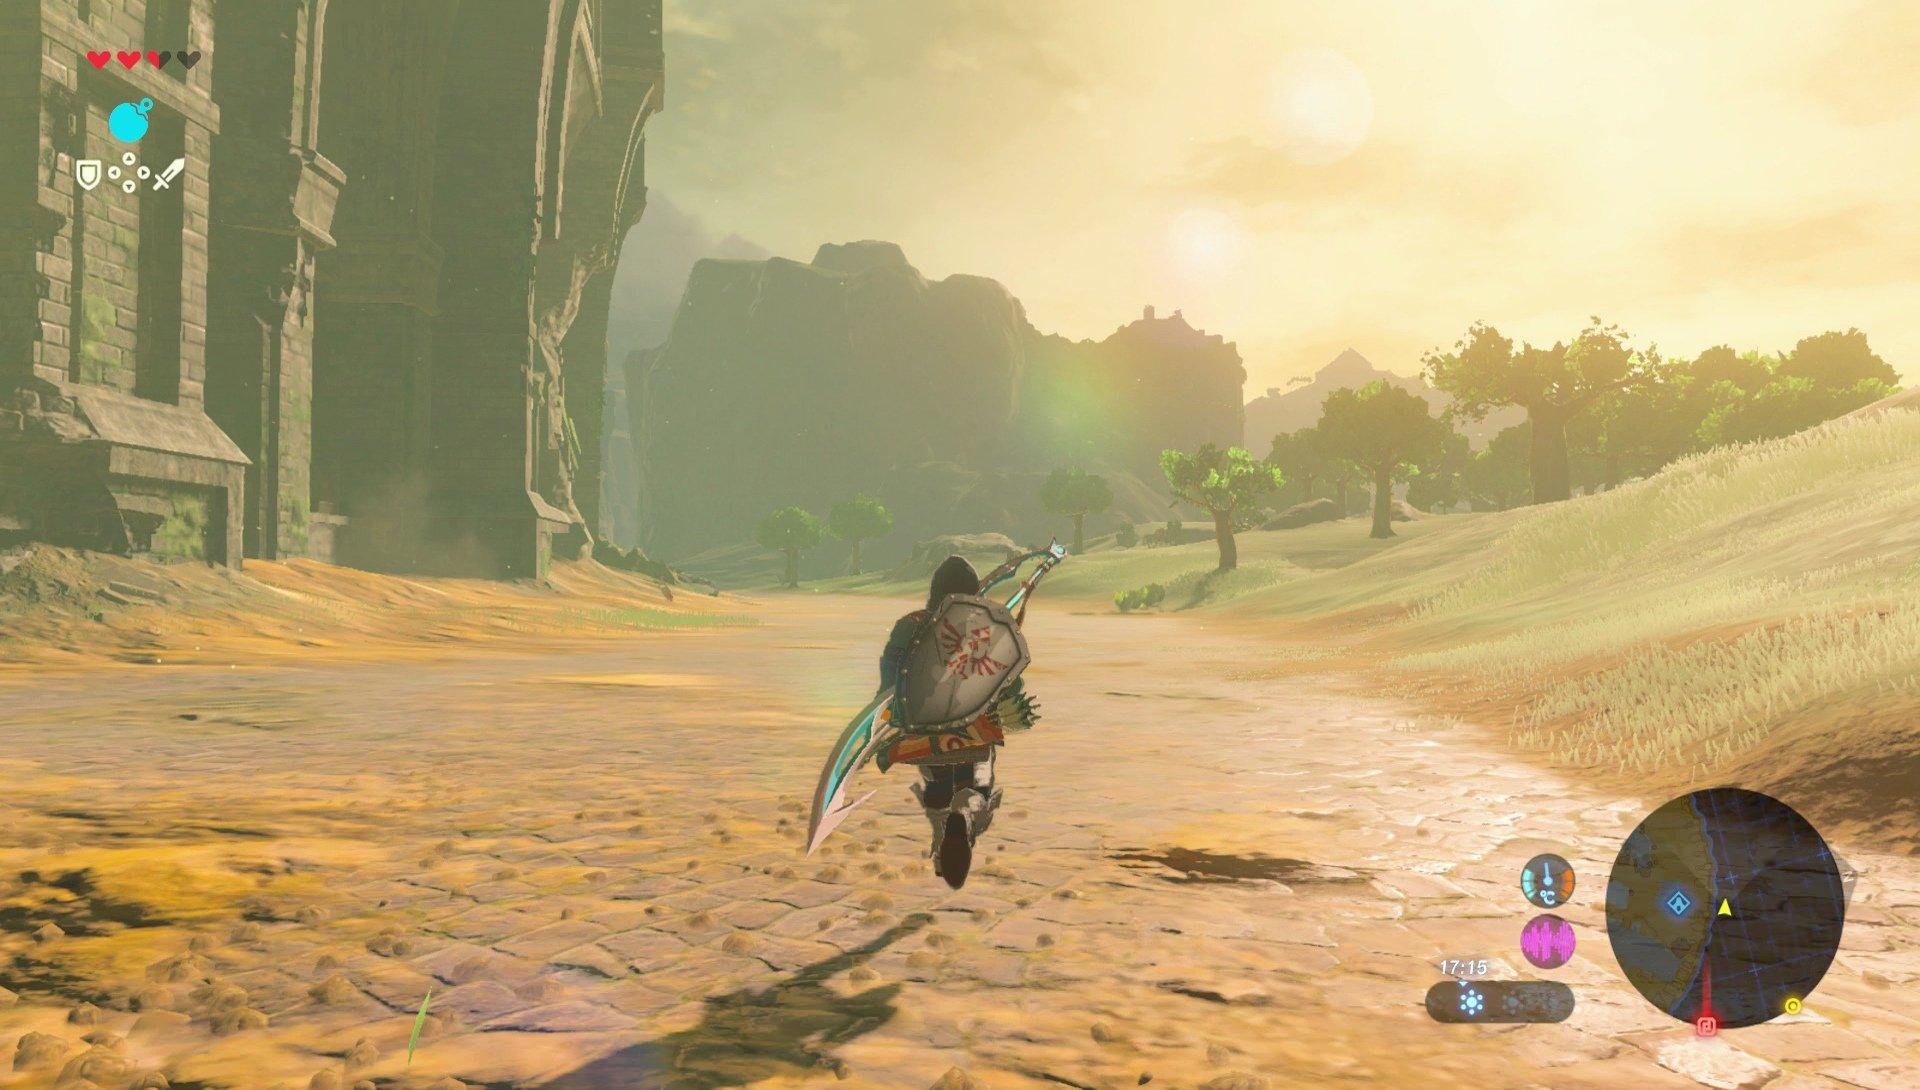 Analisis De The Legend Of Zelda Breath Of The Wild Para Nintendo